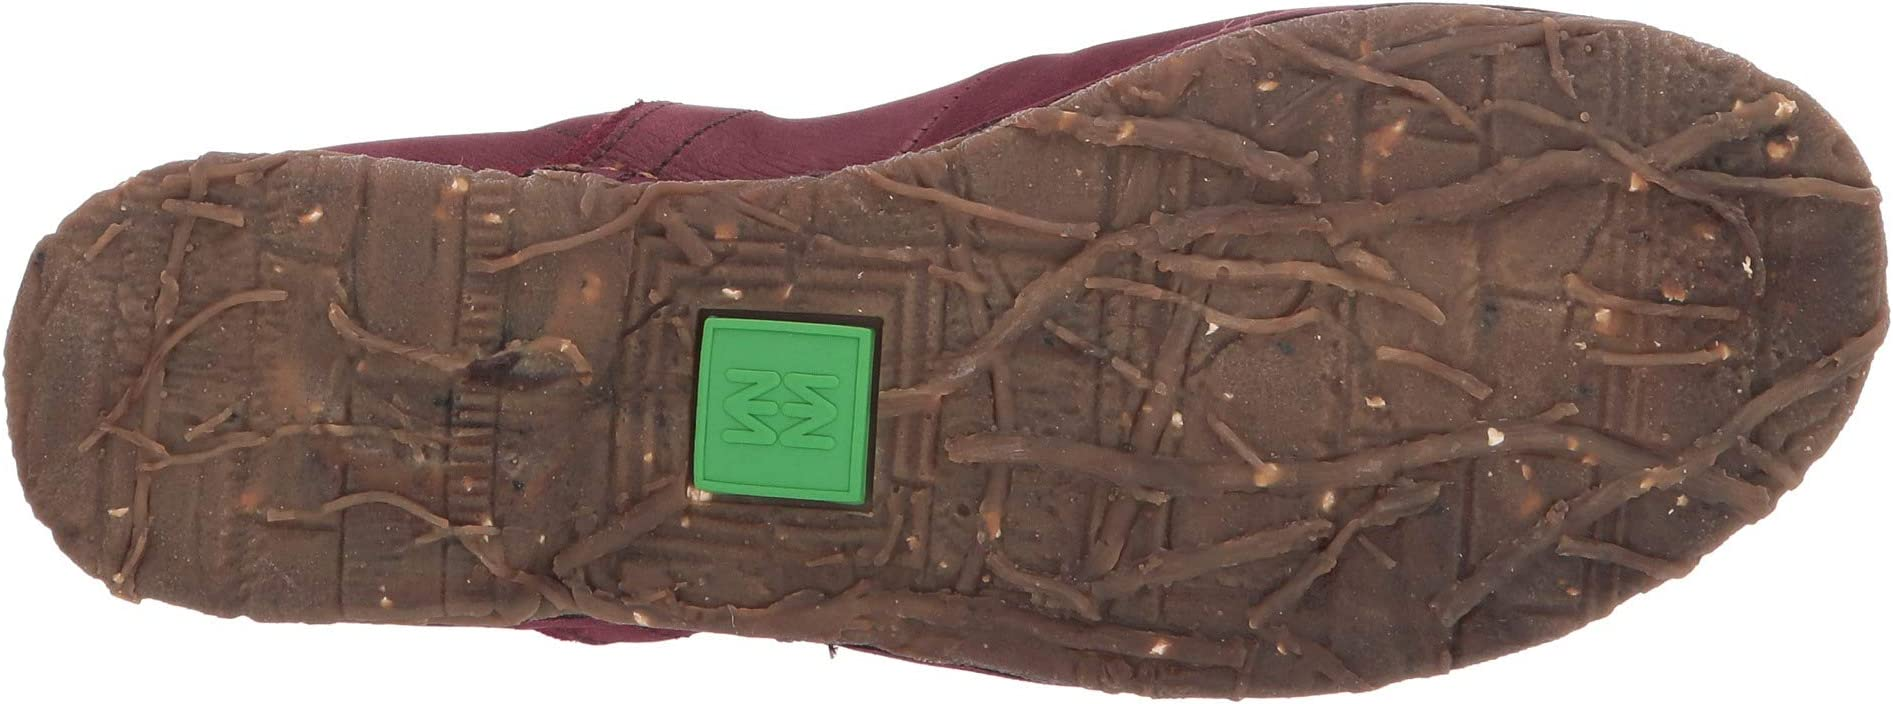 El Naturalista Angkor N959 | Women's shoes | 2020 Newest